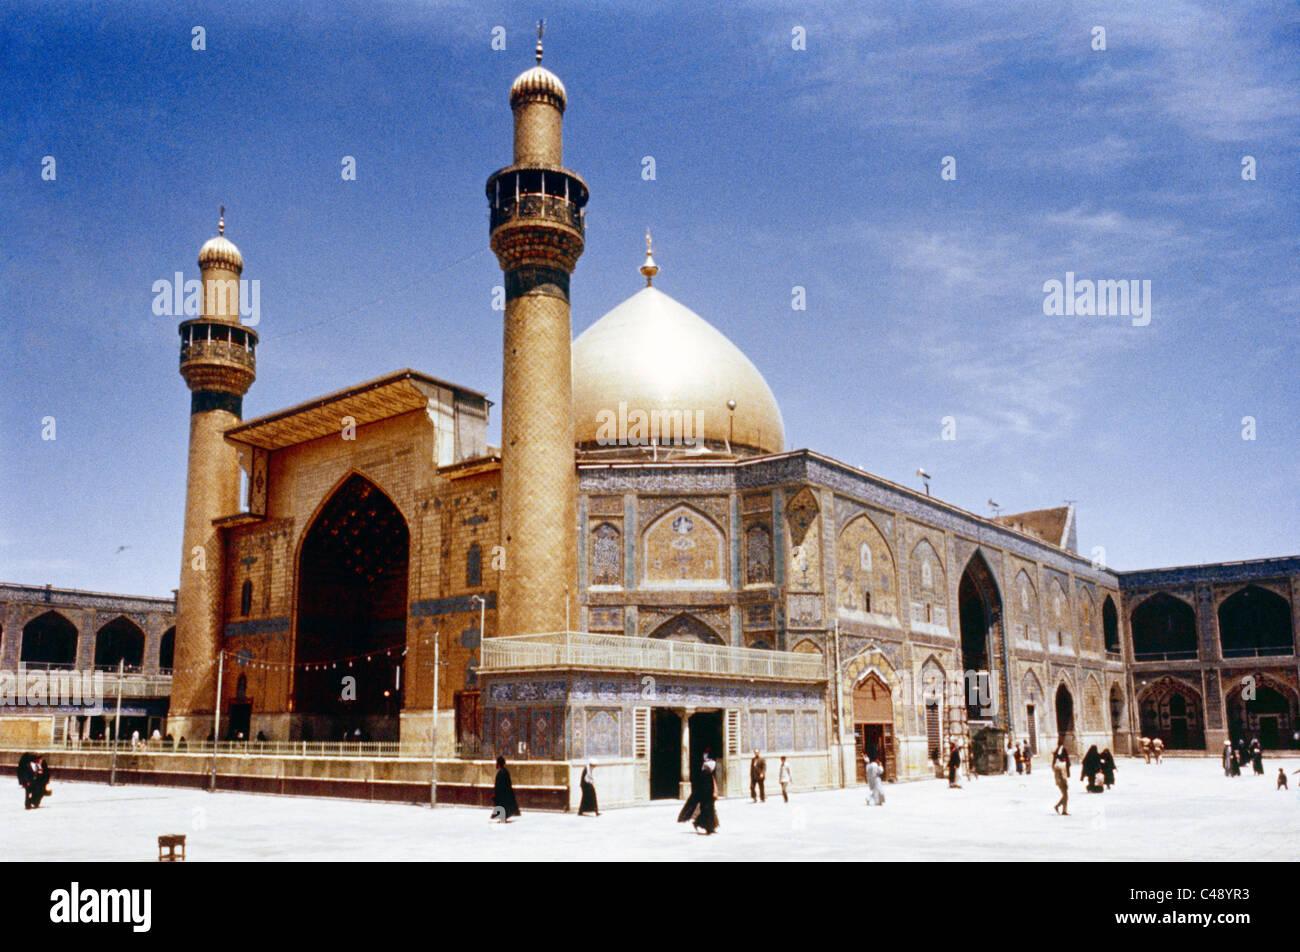 Maula Ali Shrine Wallpaper: Najaf Iraq Holy Shrine Of Iman Ali Ibn Abi Talib Shi'ite